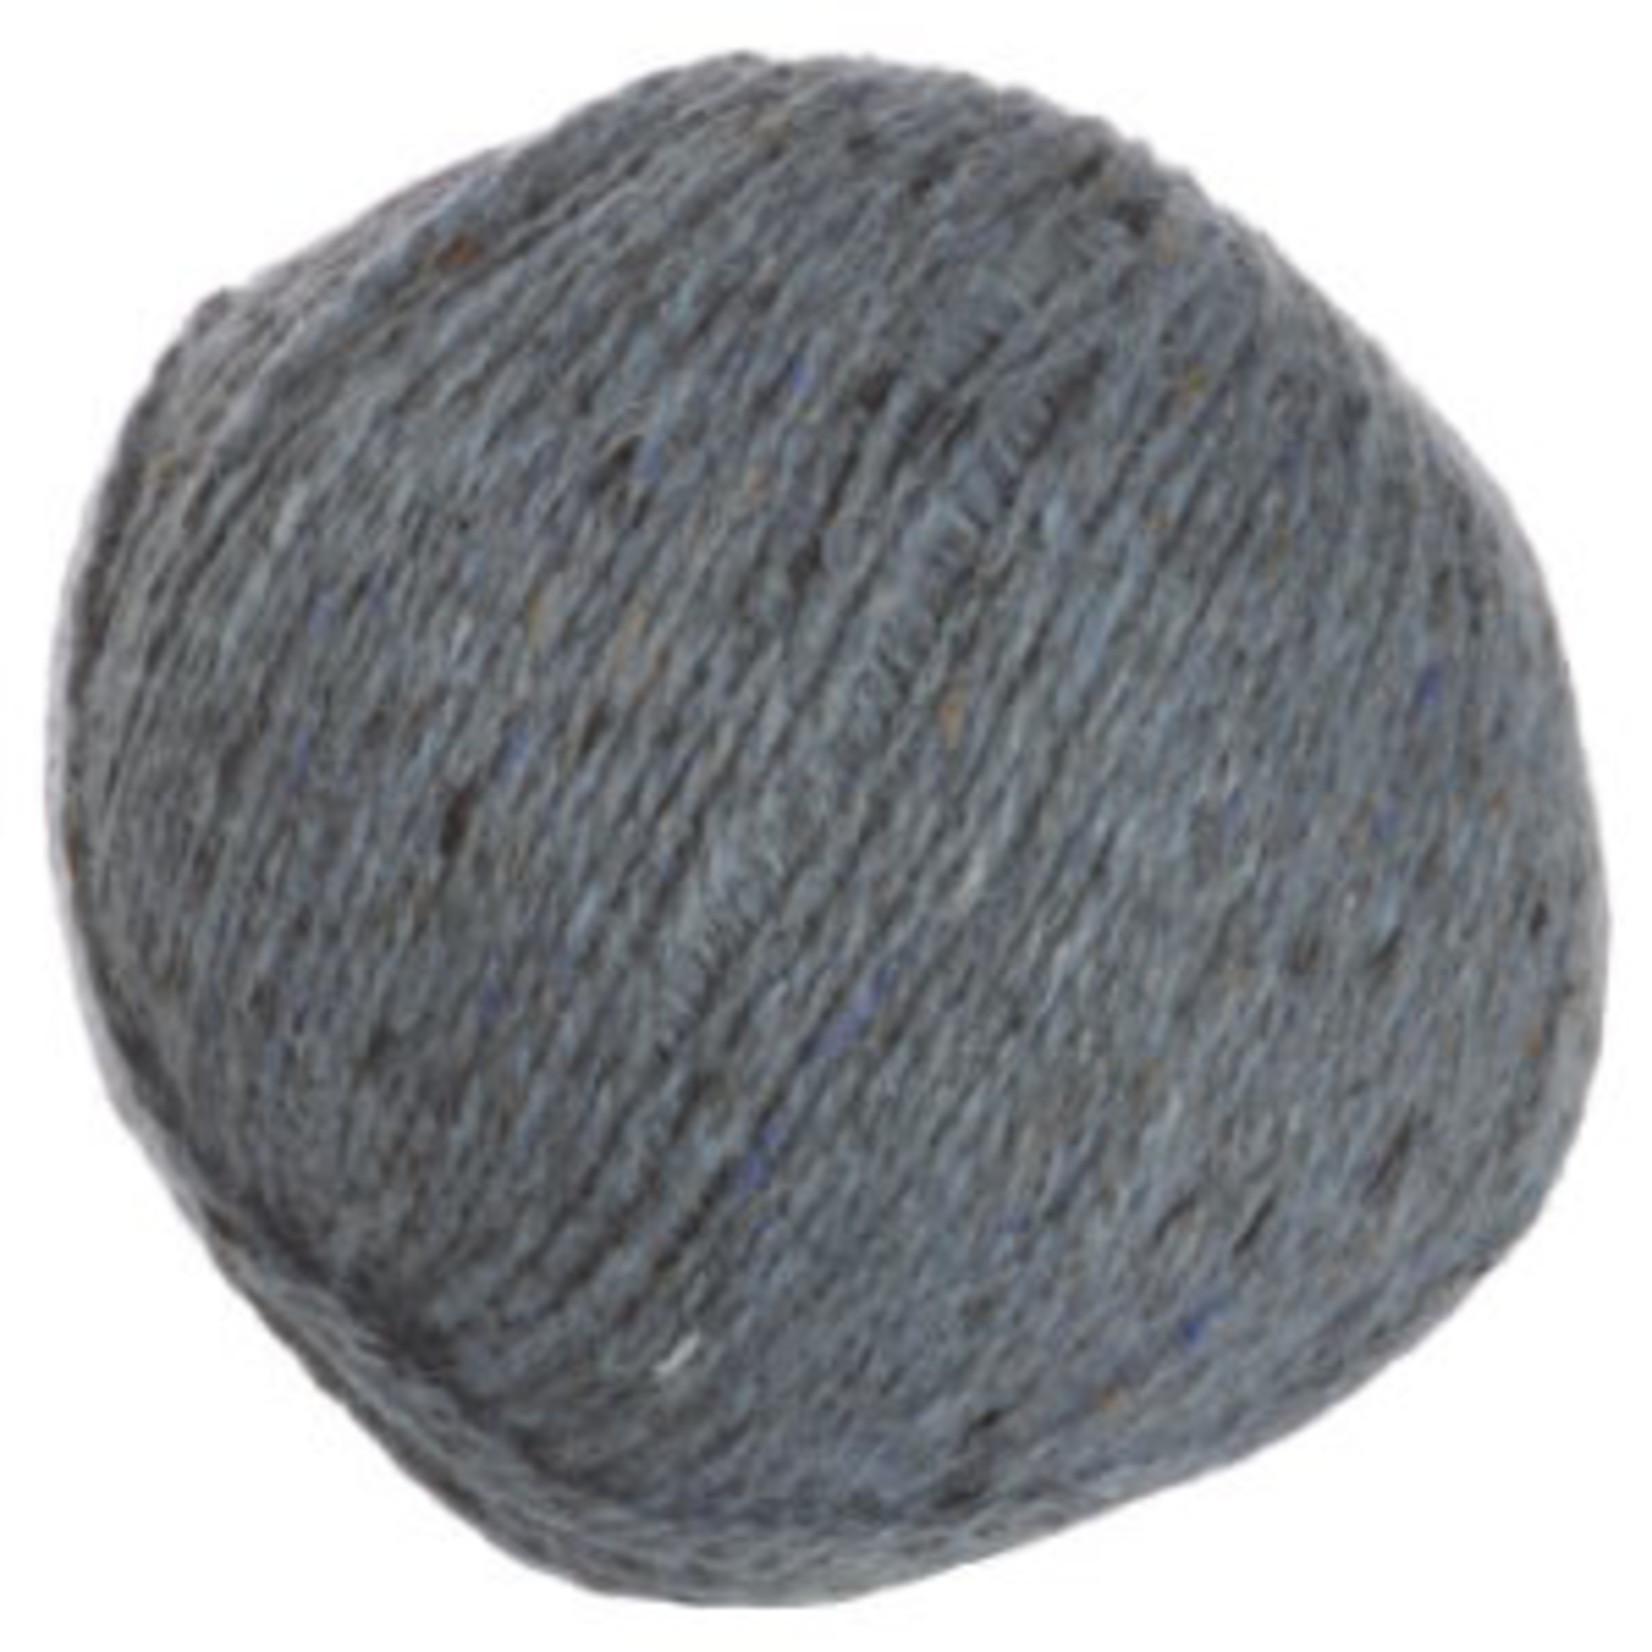 Sirdar Spinning Felted Tweed, 173, Duck Egg